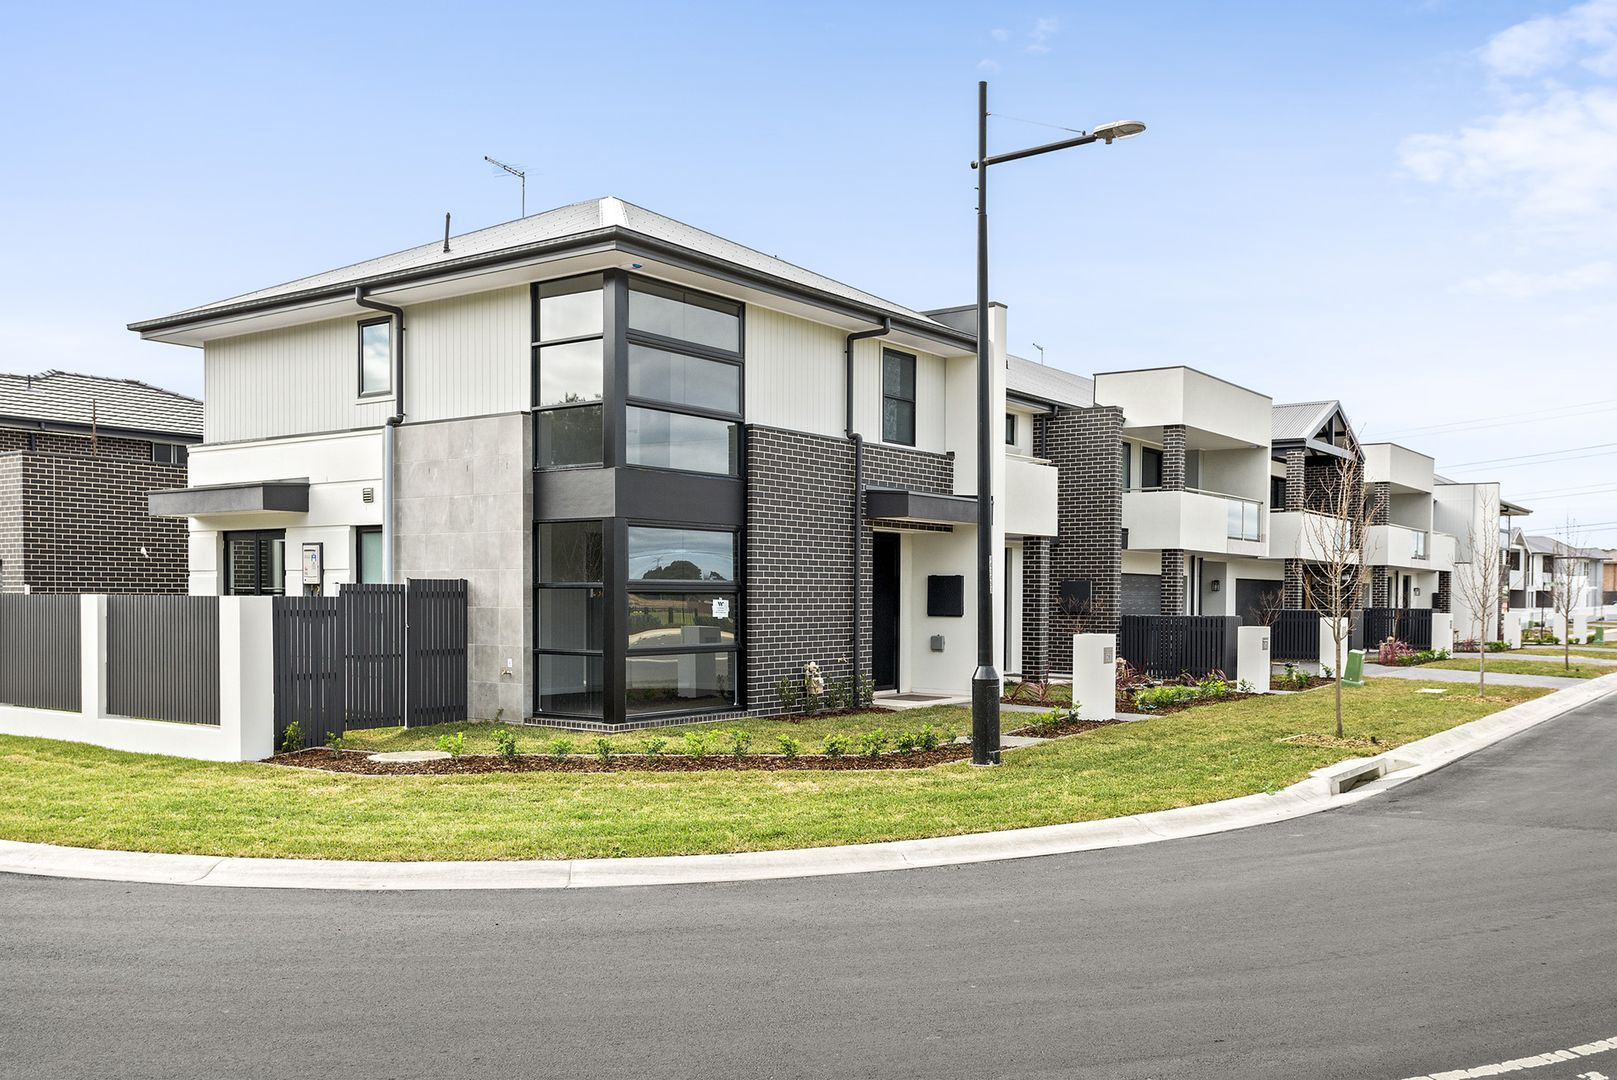 9 O'Keefe Drive, Oran Park, NSW 2570, Image 0